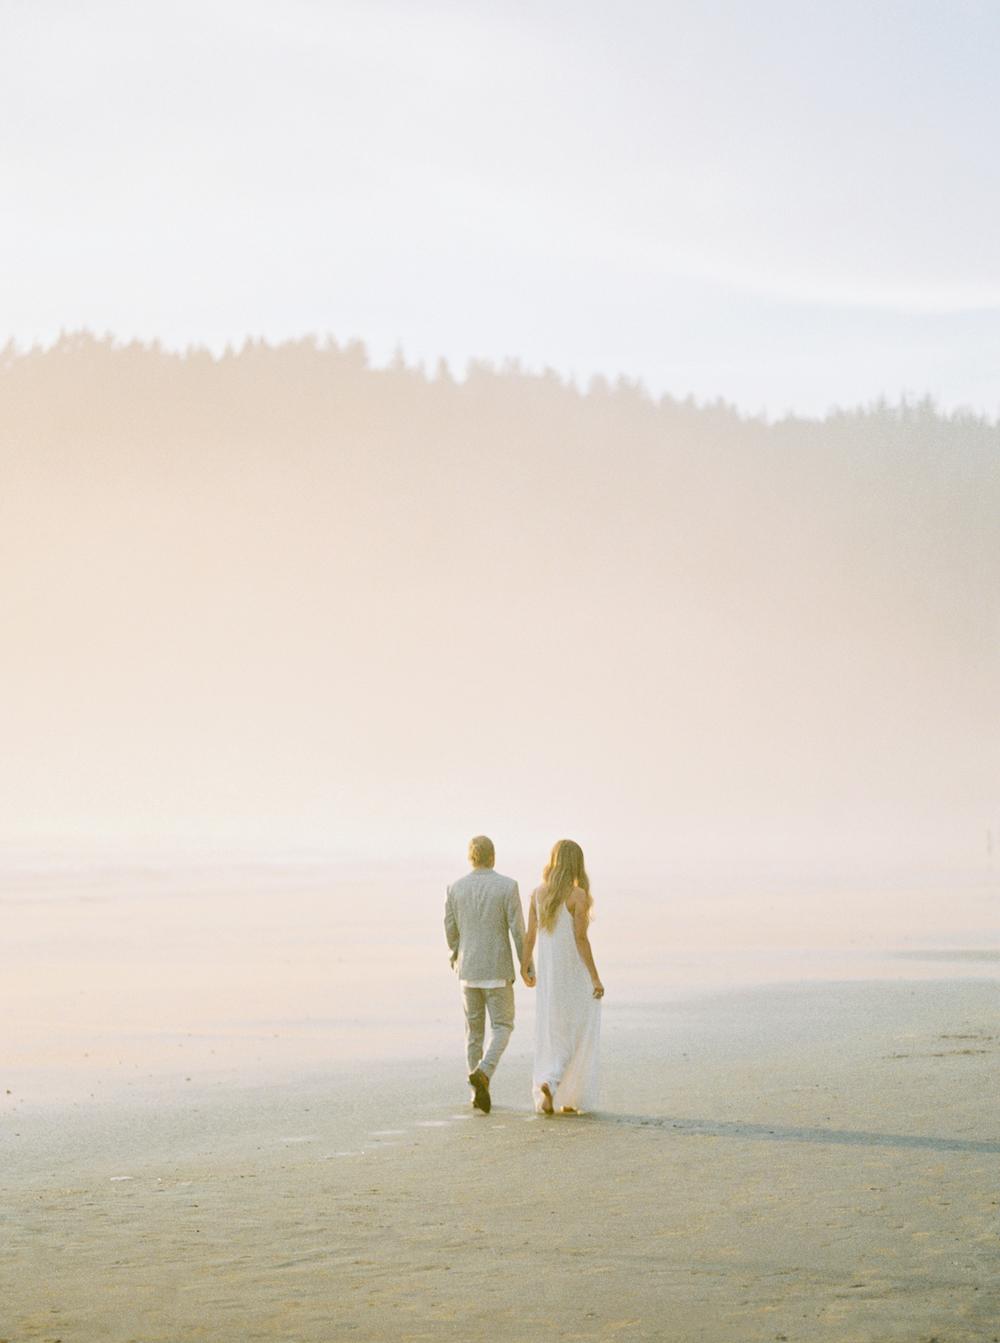 Katie-nicolle-niagara-wedding-photographer-film-fine-art-toronto-85.jpg